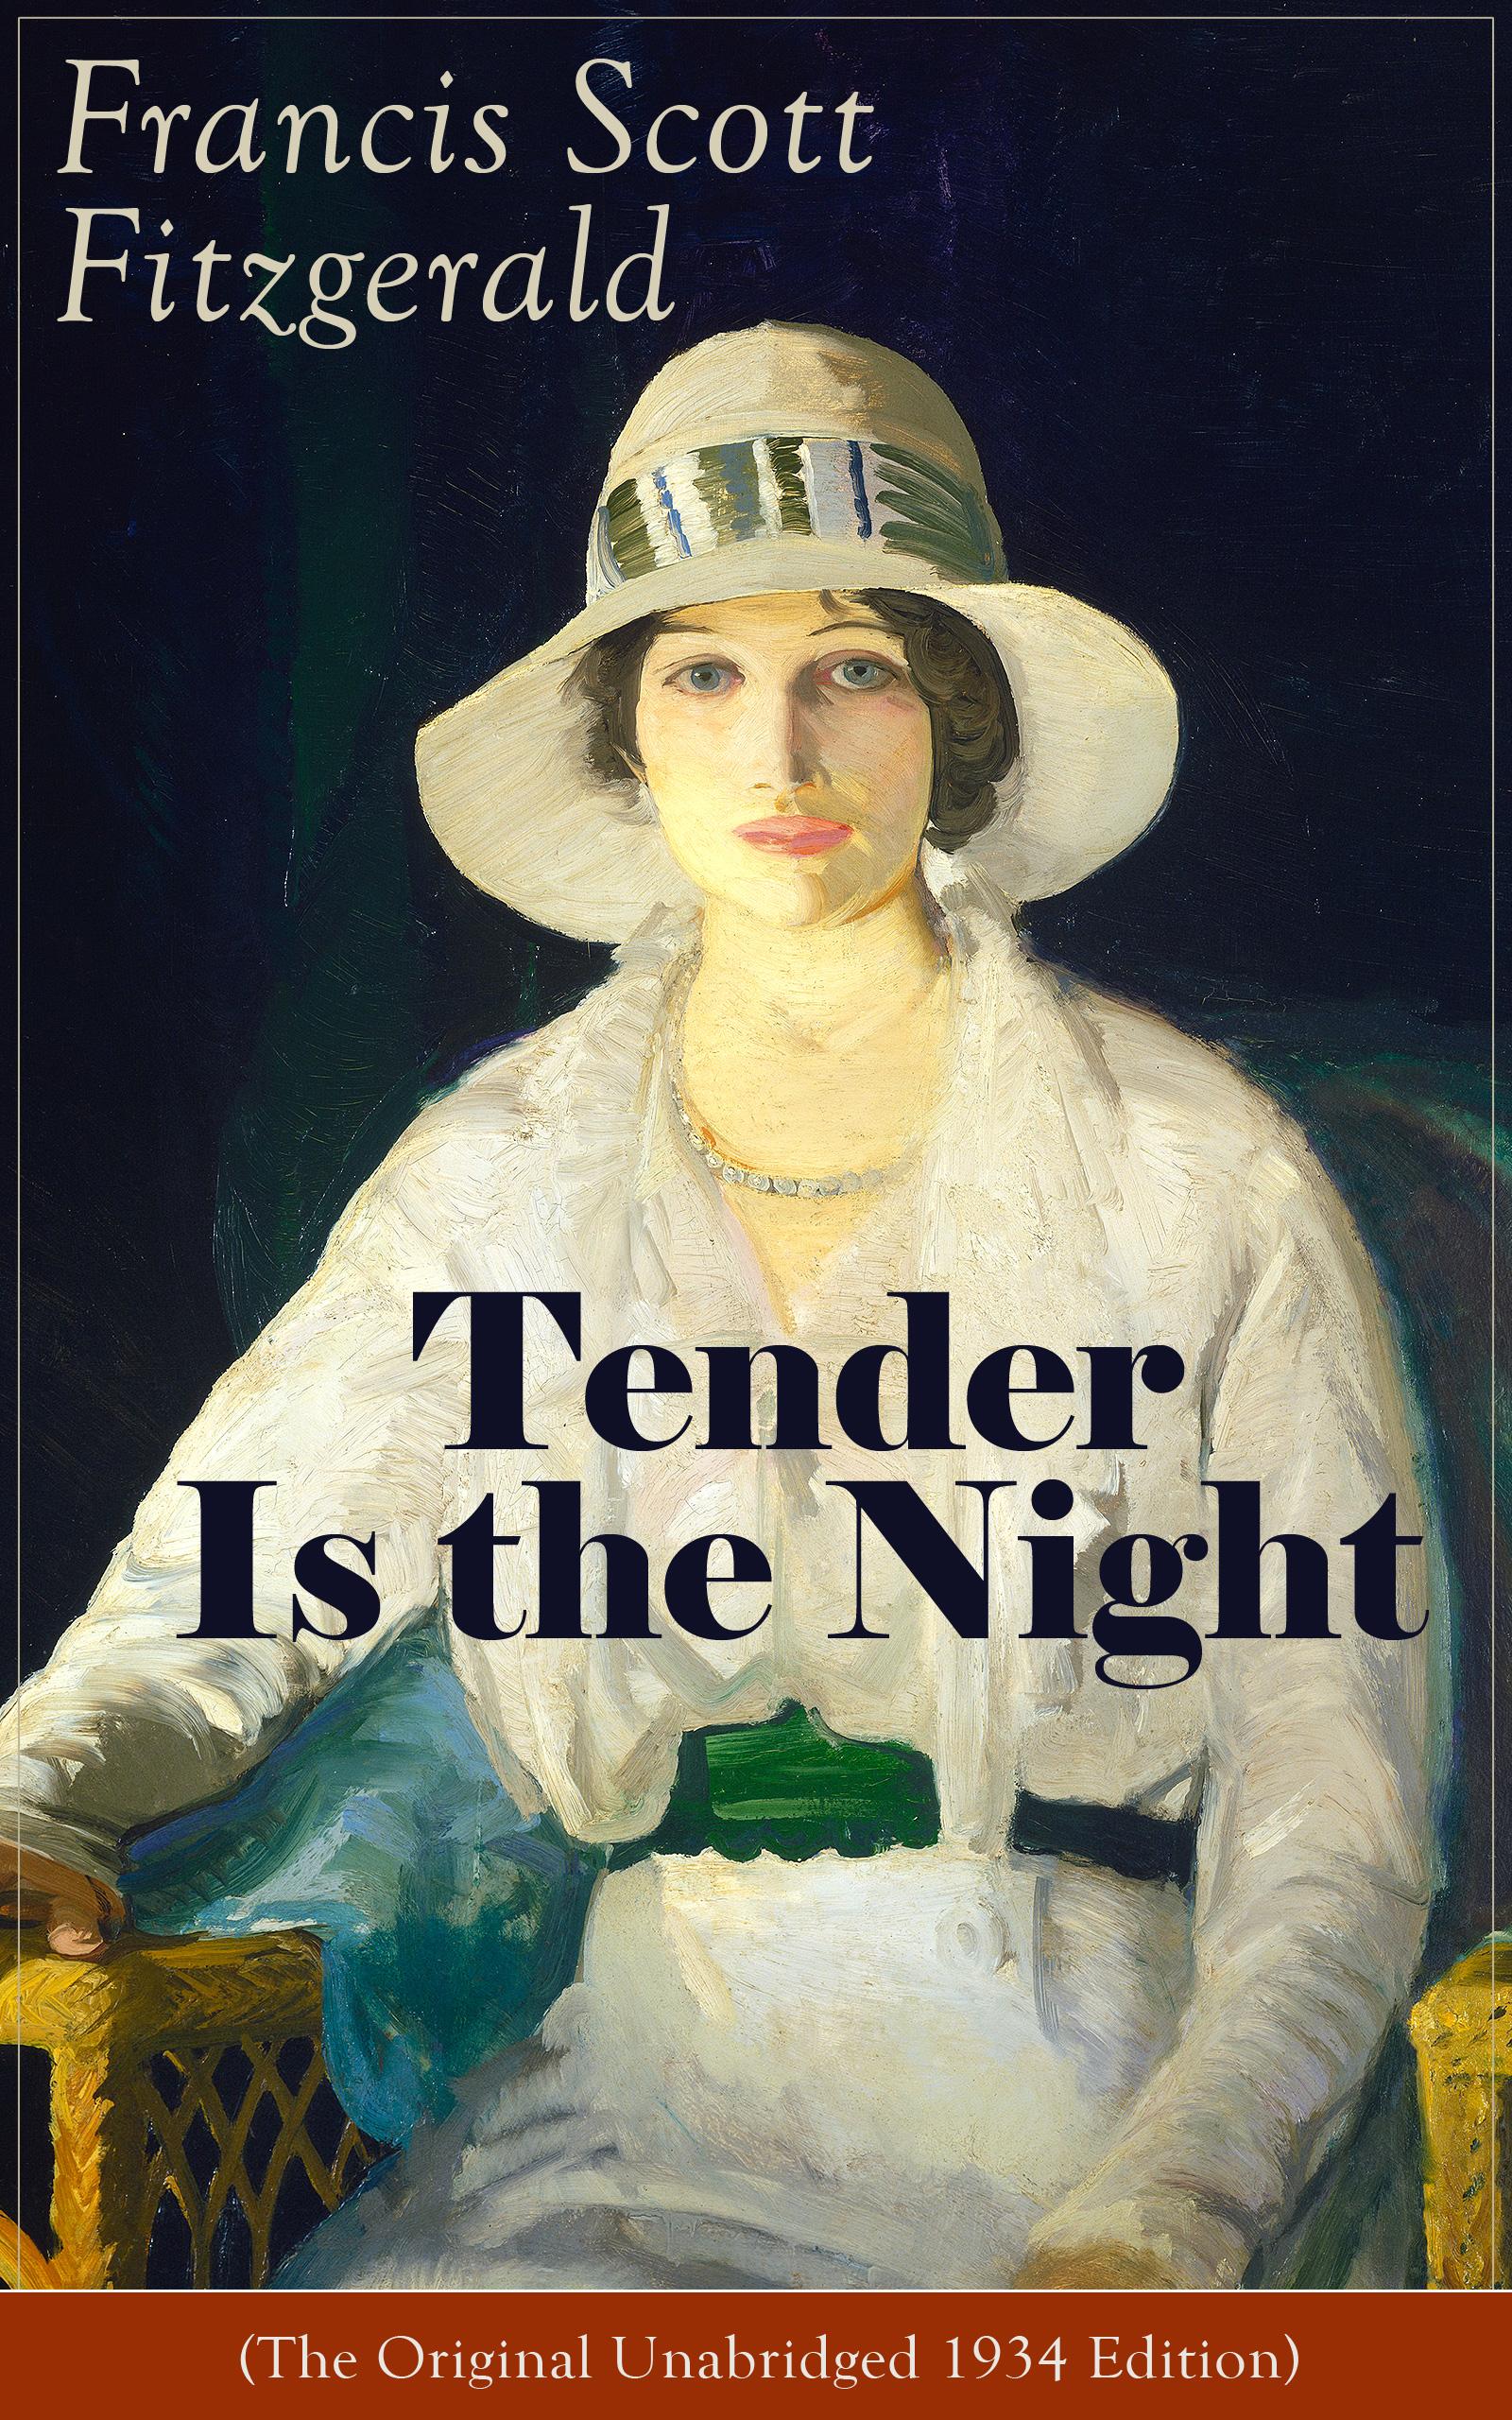 Francis Scott Fitzgerald Tender Is the Night (The Original Unabridged 1934 Edition) fitzgerald francis scott tender is the night isbn 978 5 521 00165 1